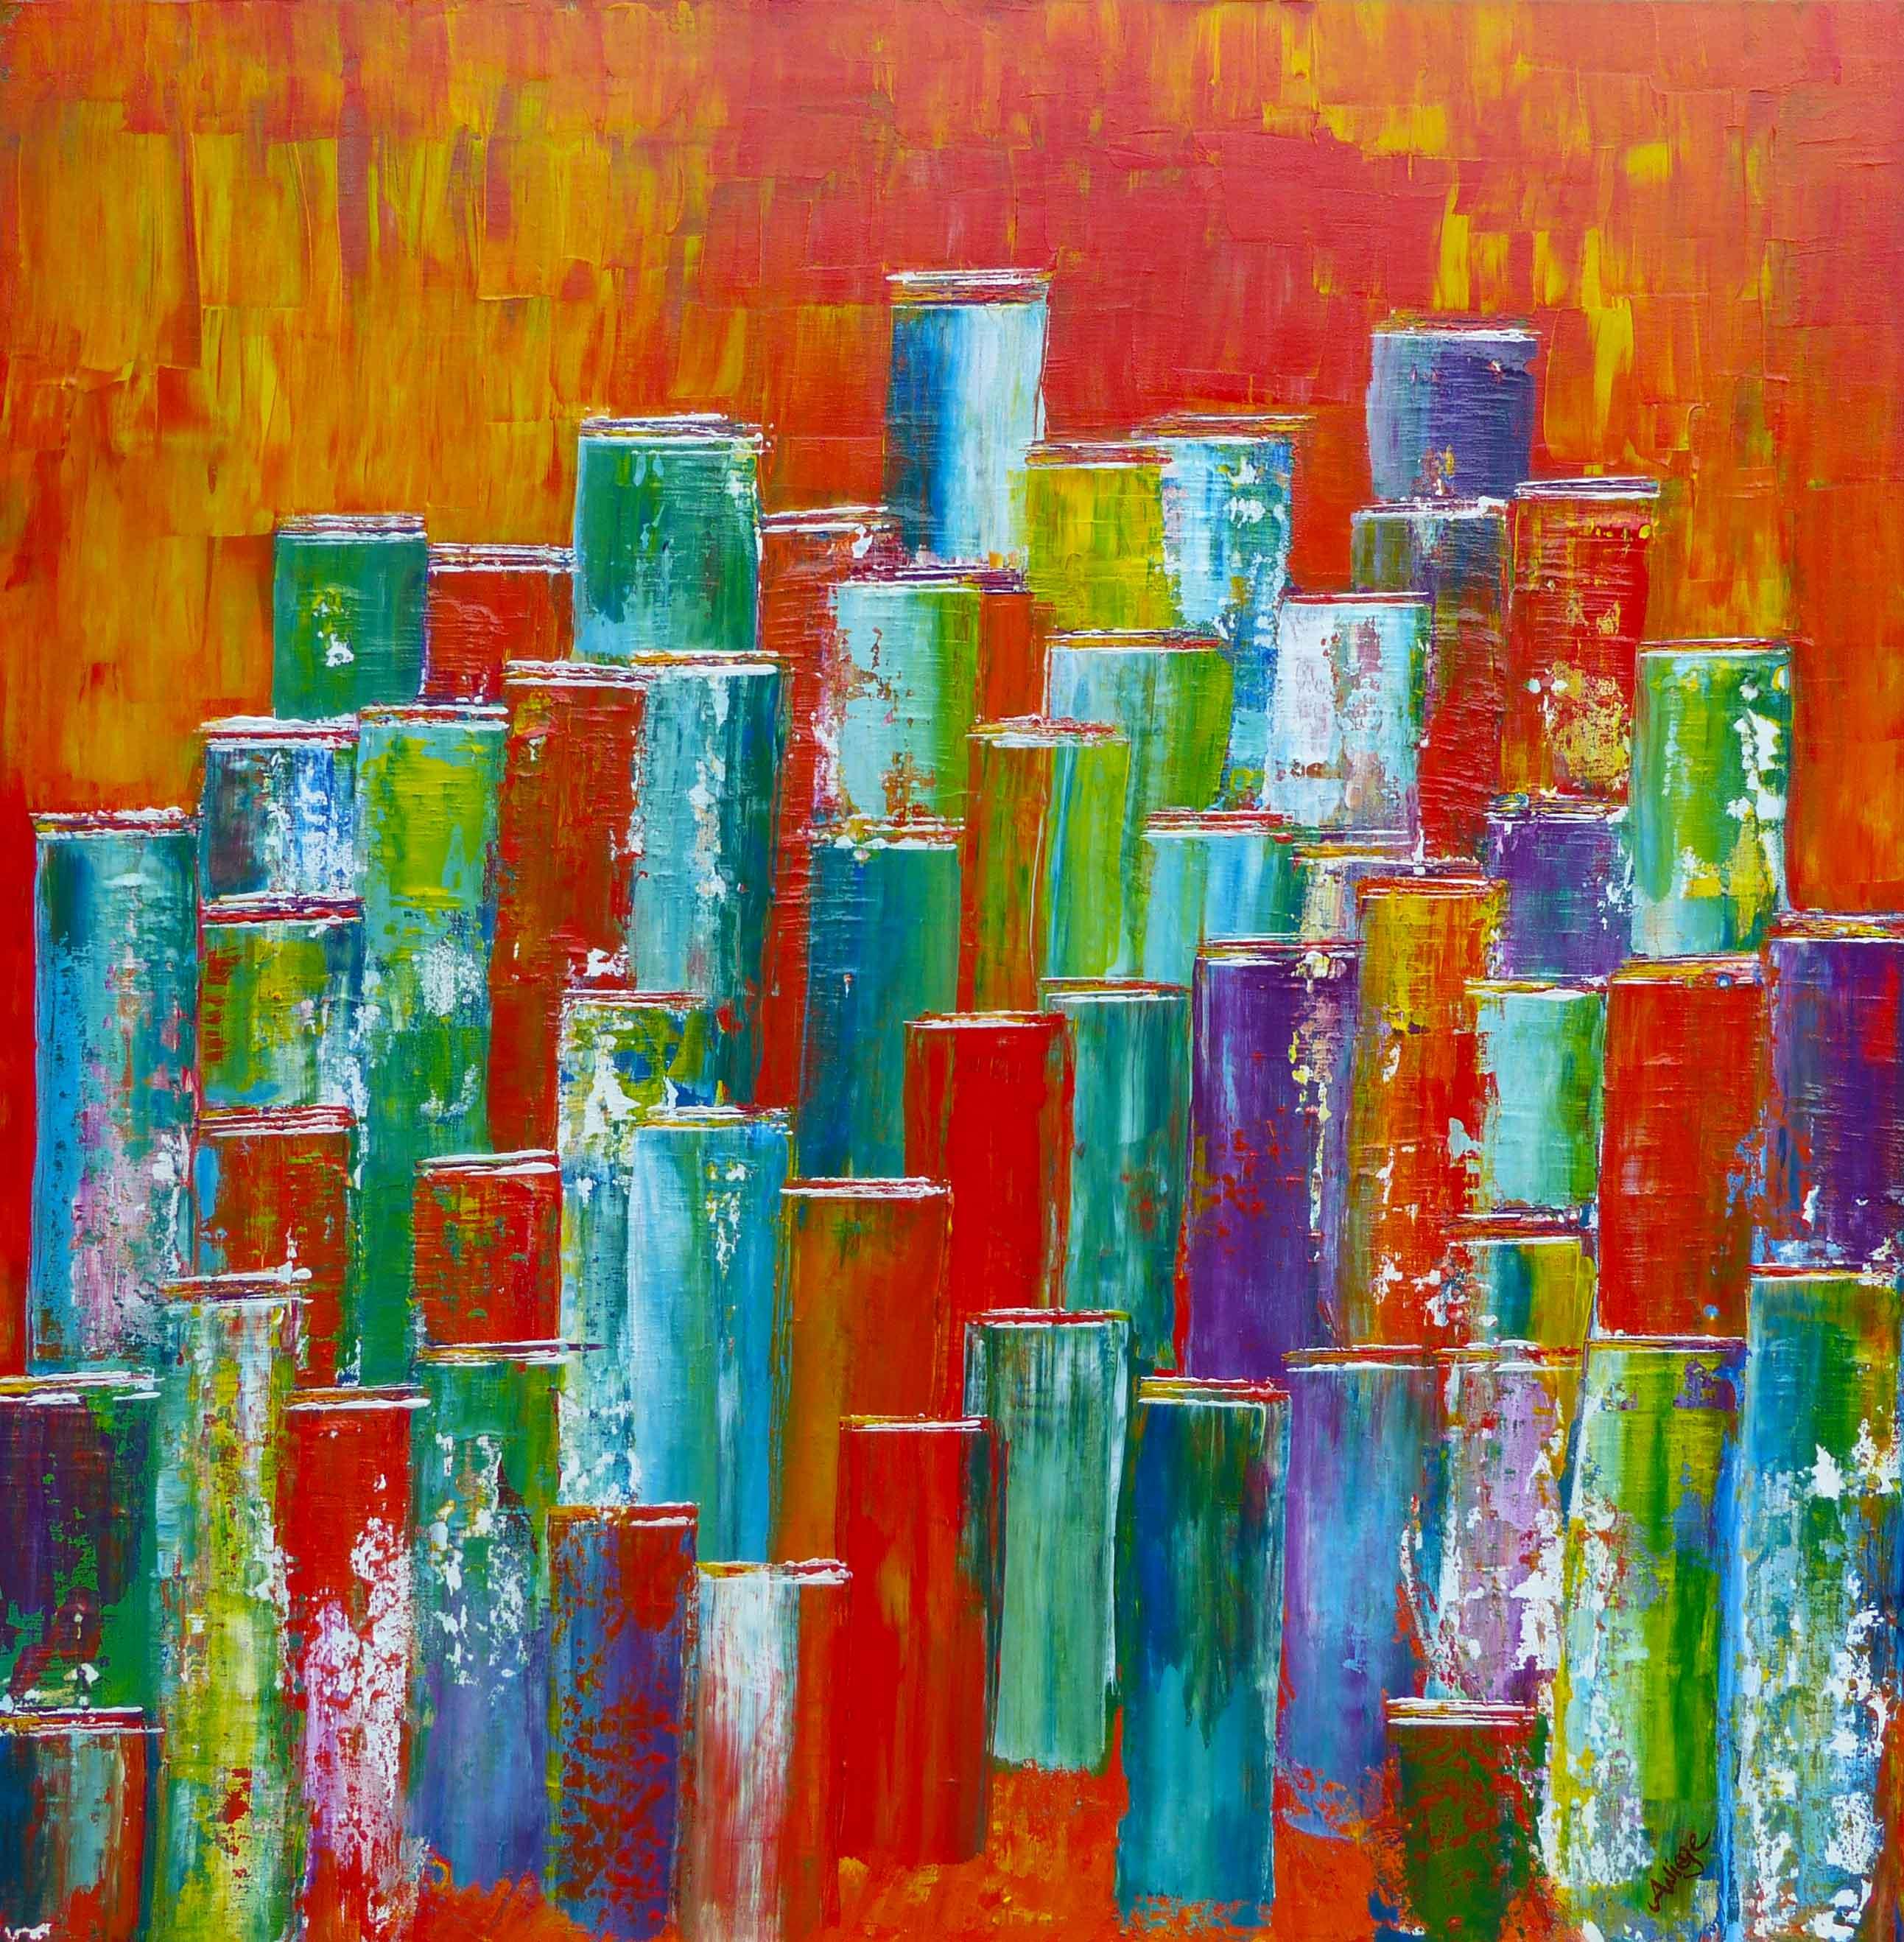 abstrakt – annette-art.de